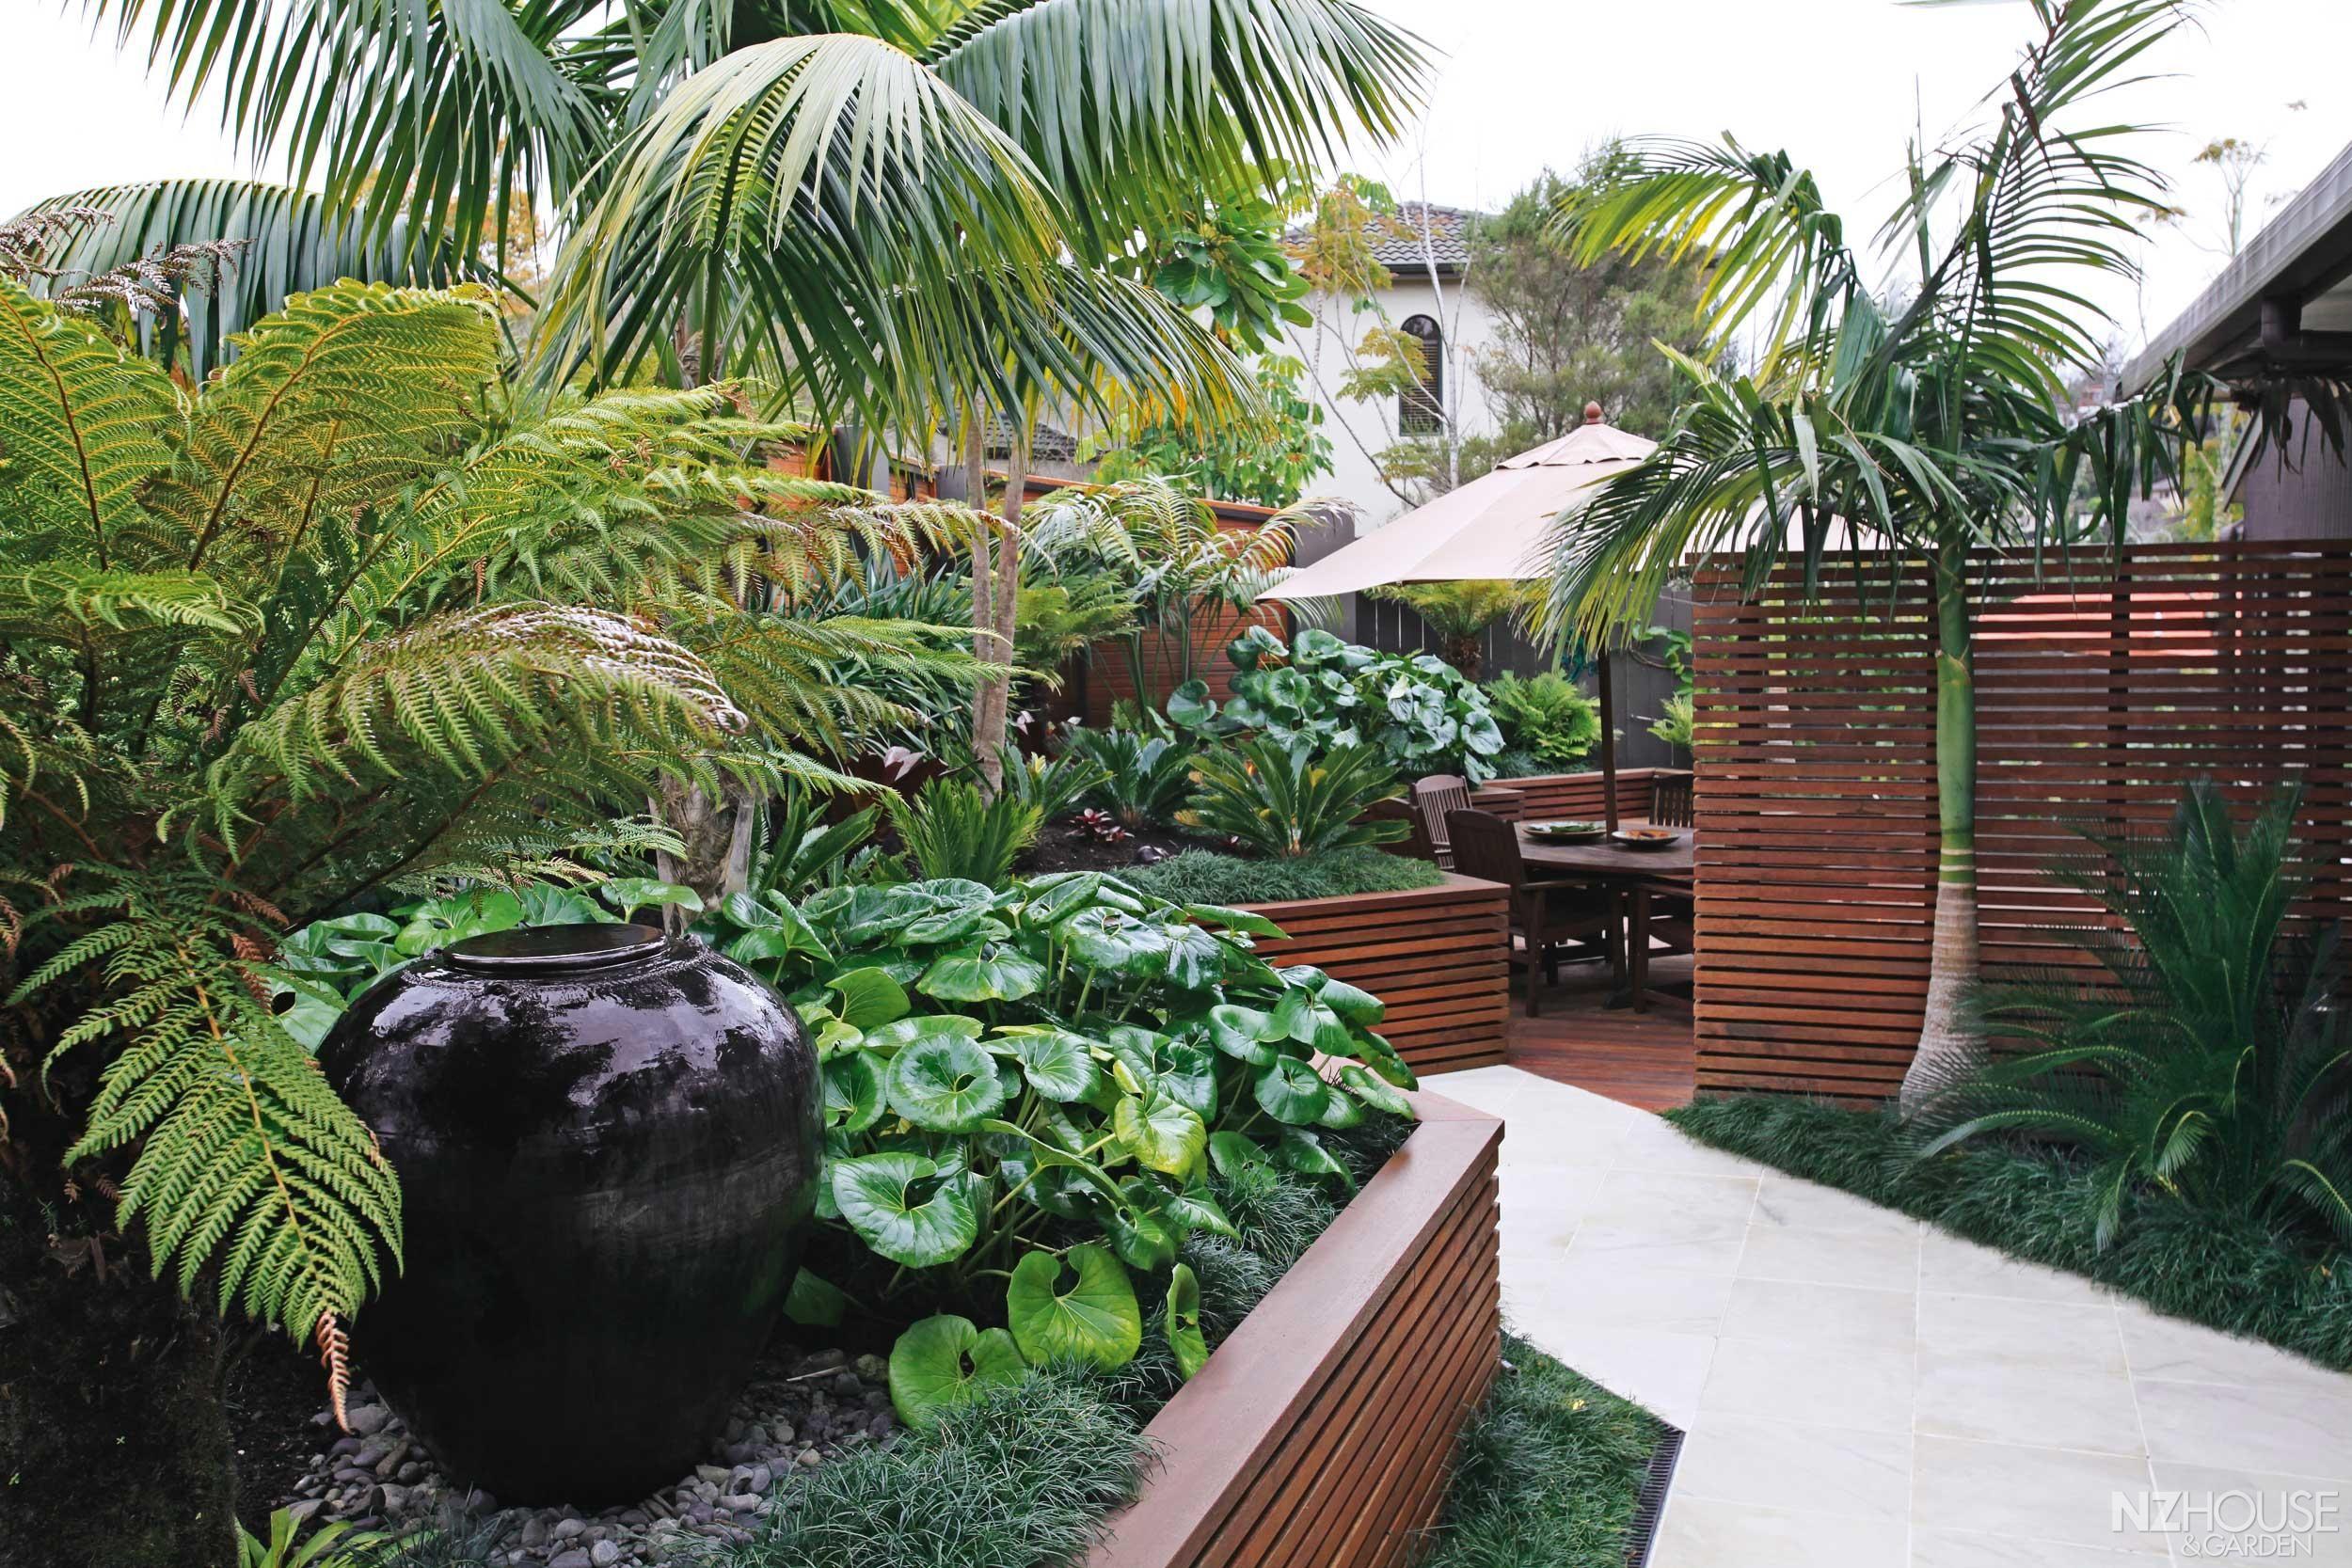 garden design auckland - Google Search   Outdoor ideas   Pinterest ...